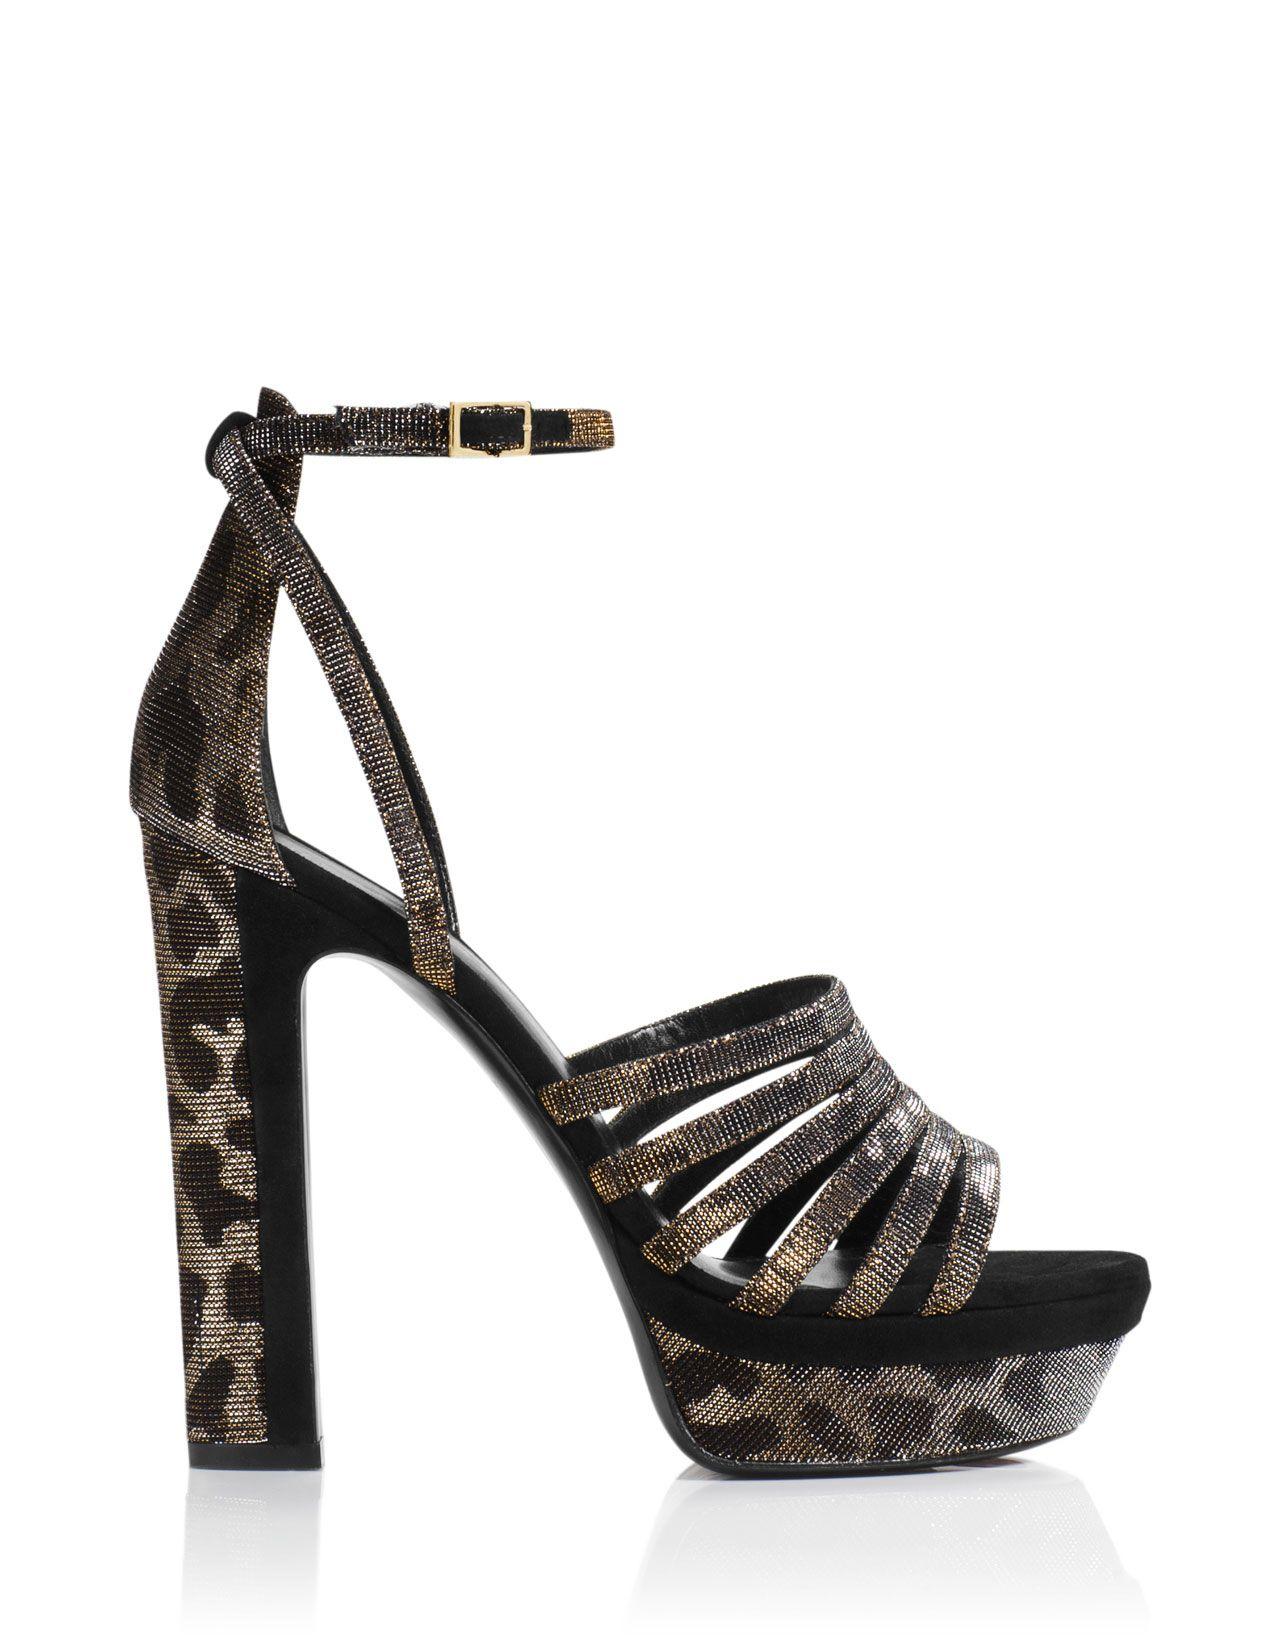 Tamara Mellon Leopard Sandal